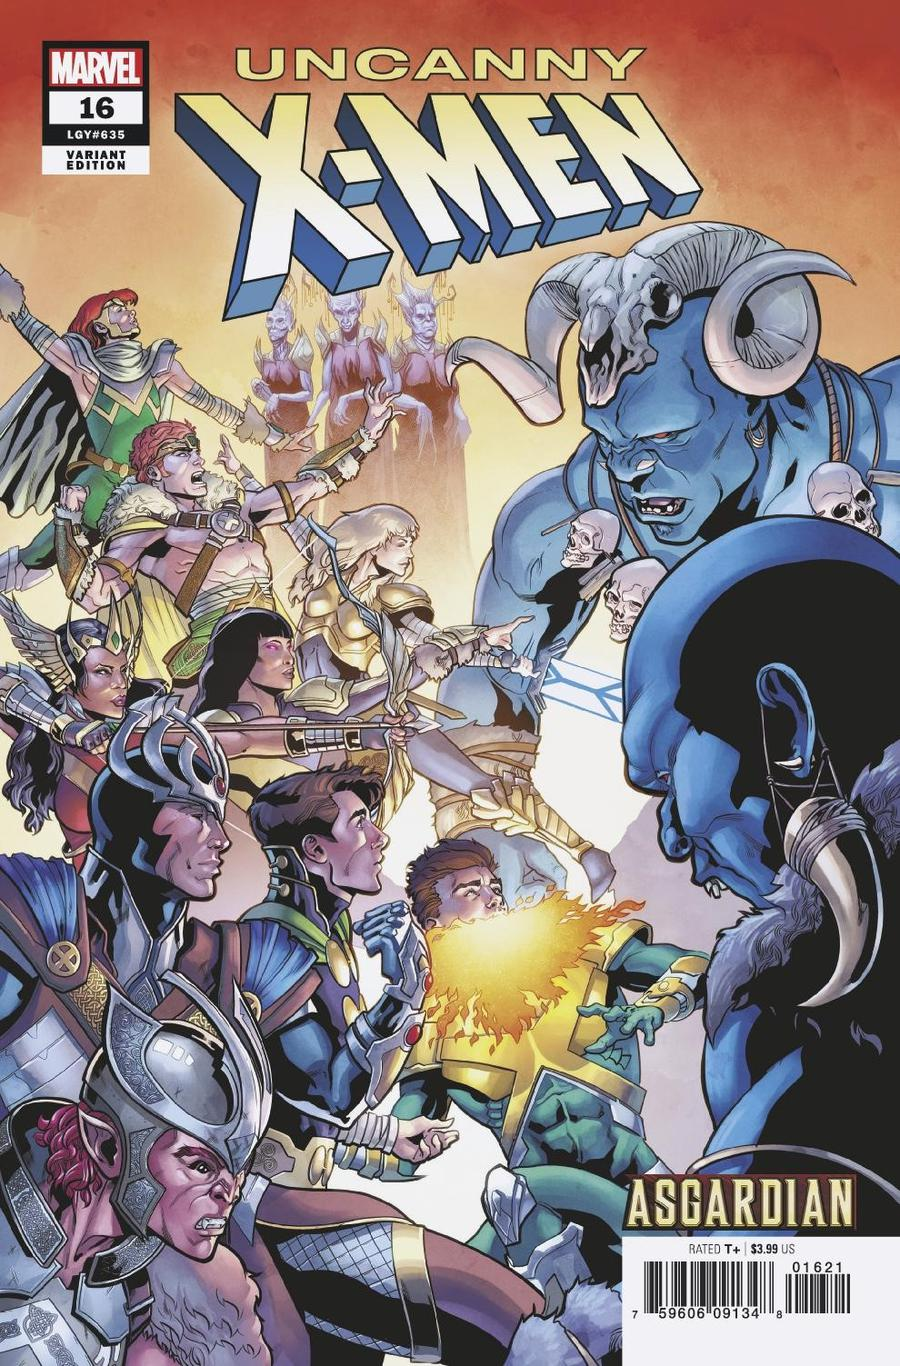 Uncanny X-Men Vol 5 #16 Cover B Variant Will Sliney Asgardian Cover